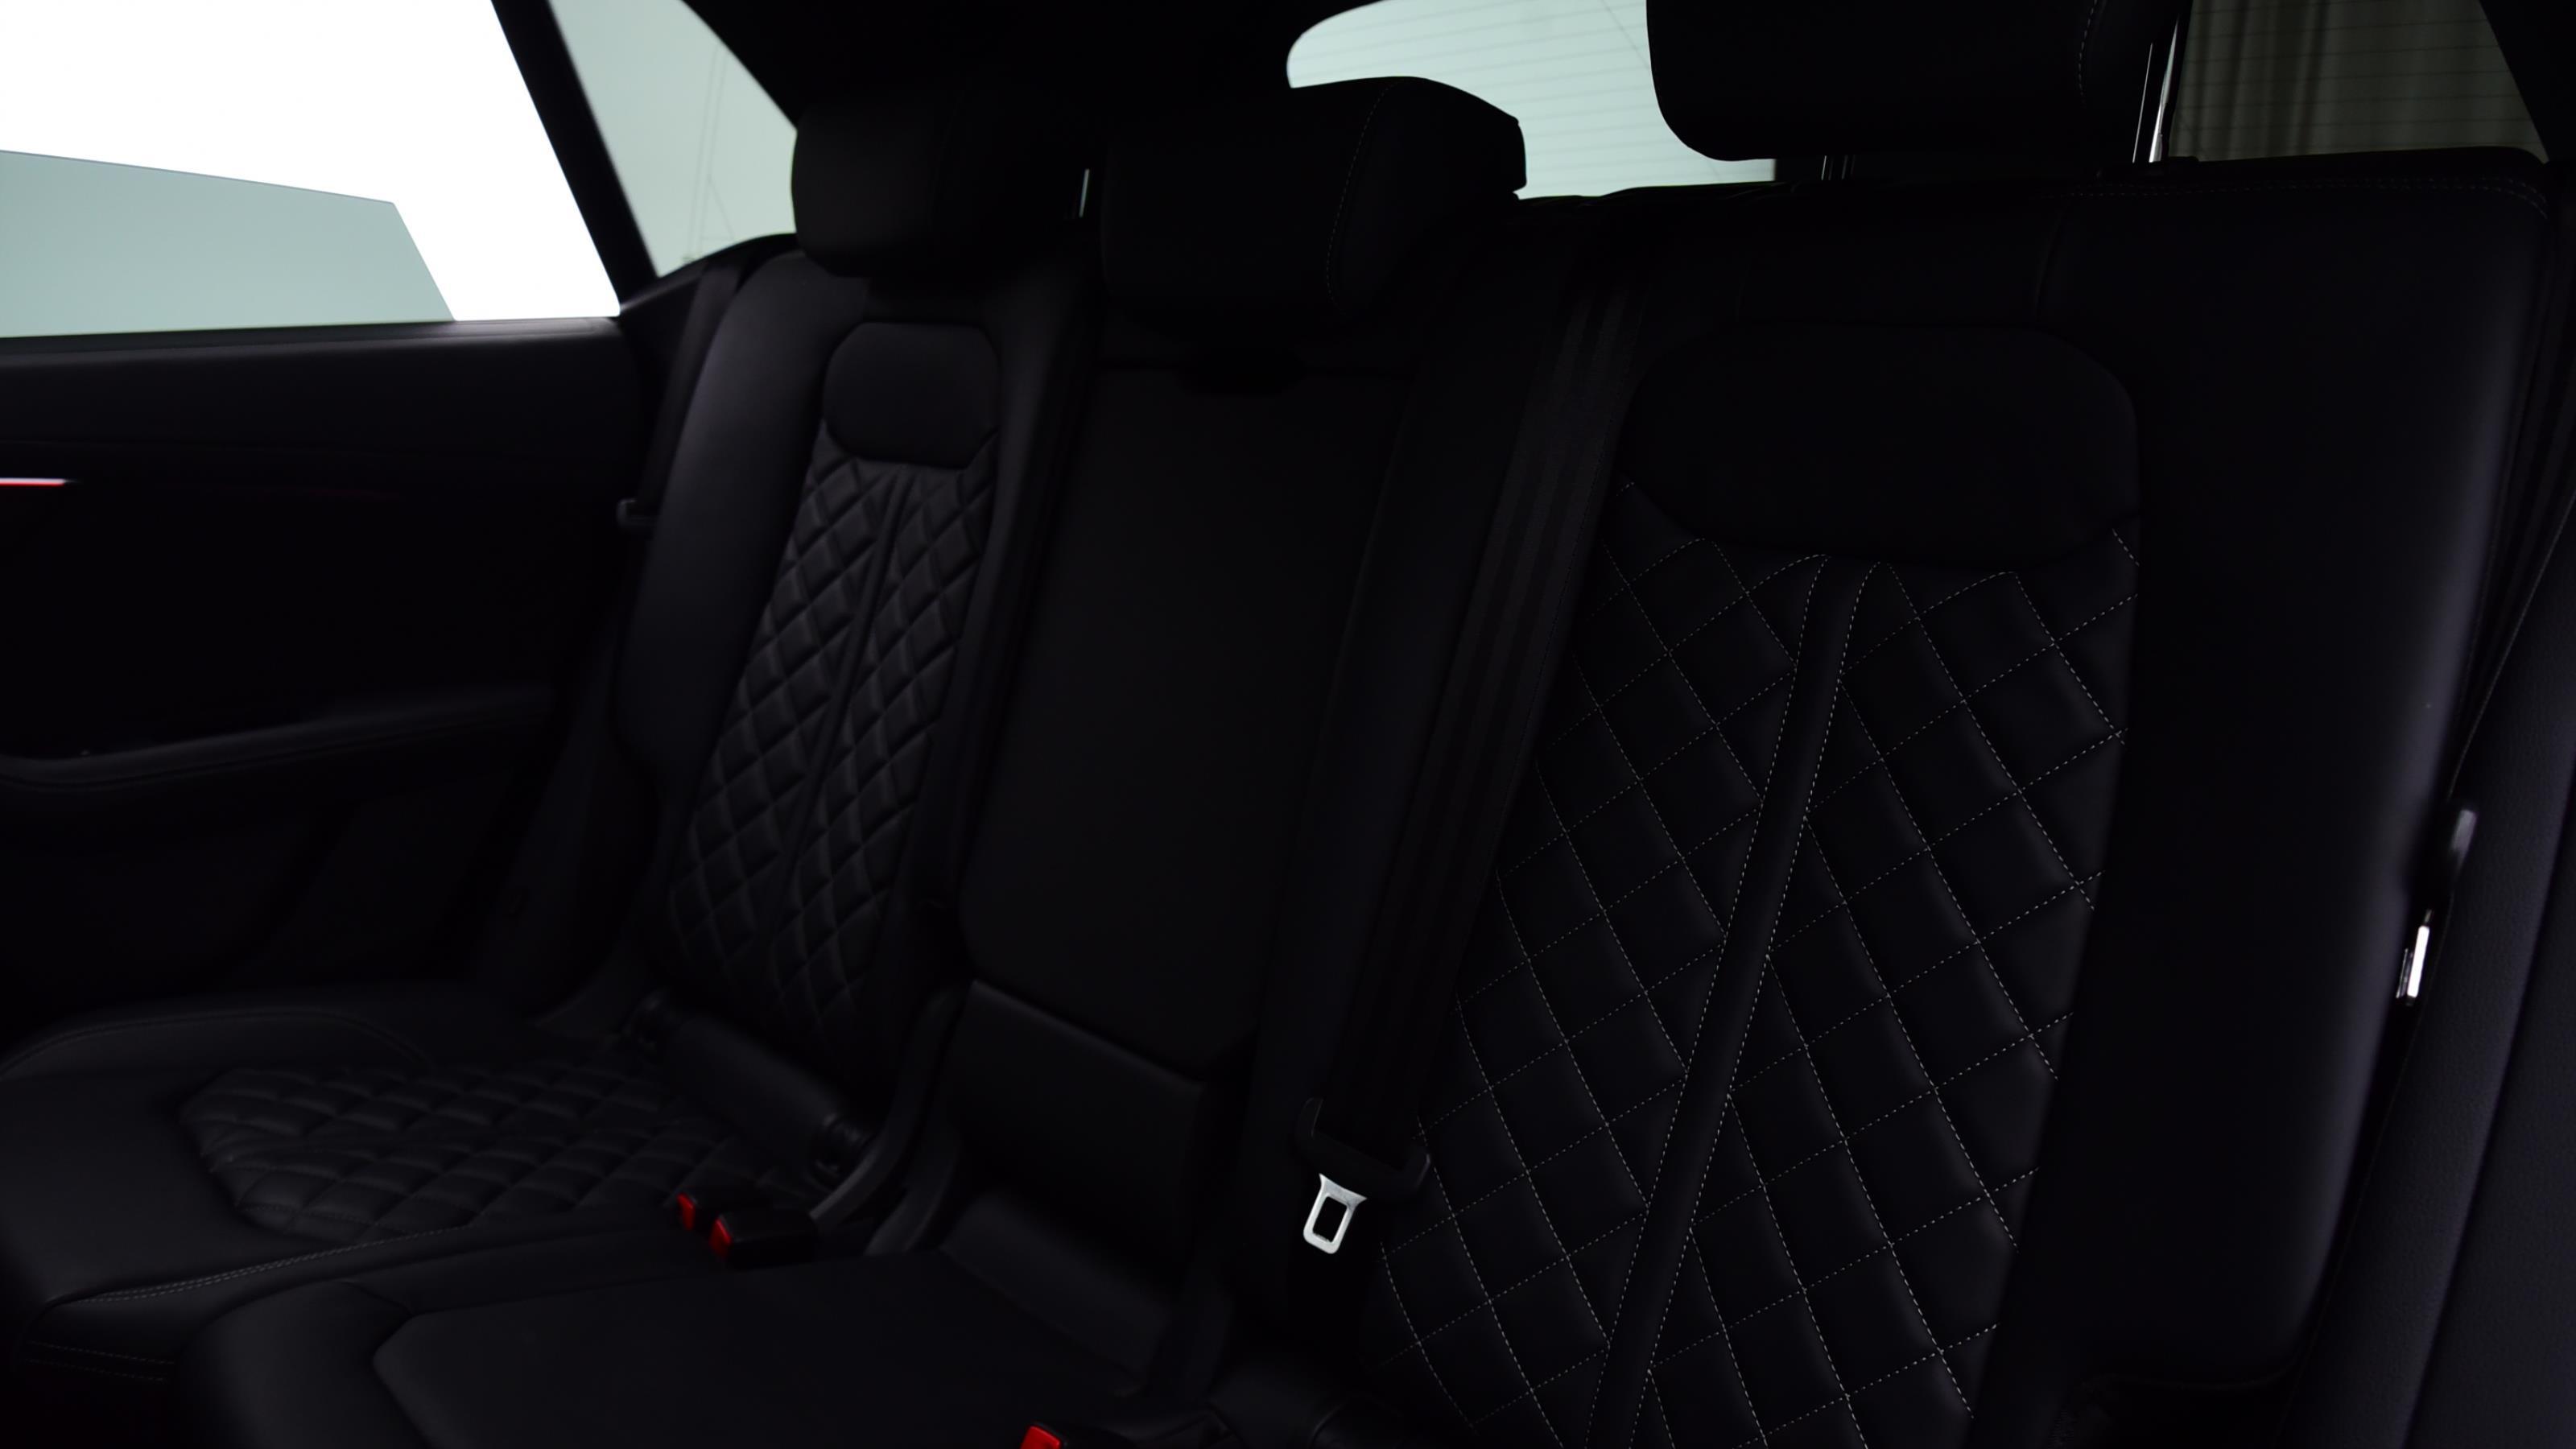 Used 2018 Audi Q8 50 TDI Quattro S Line 5dr Tiptronic           at Saxton4x4